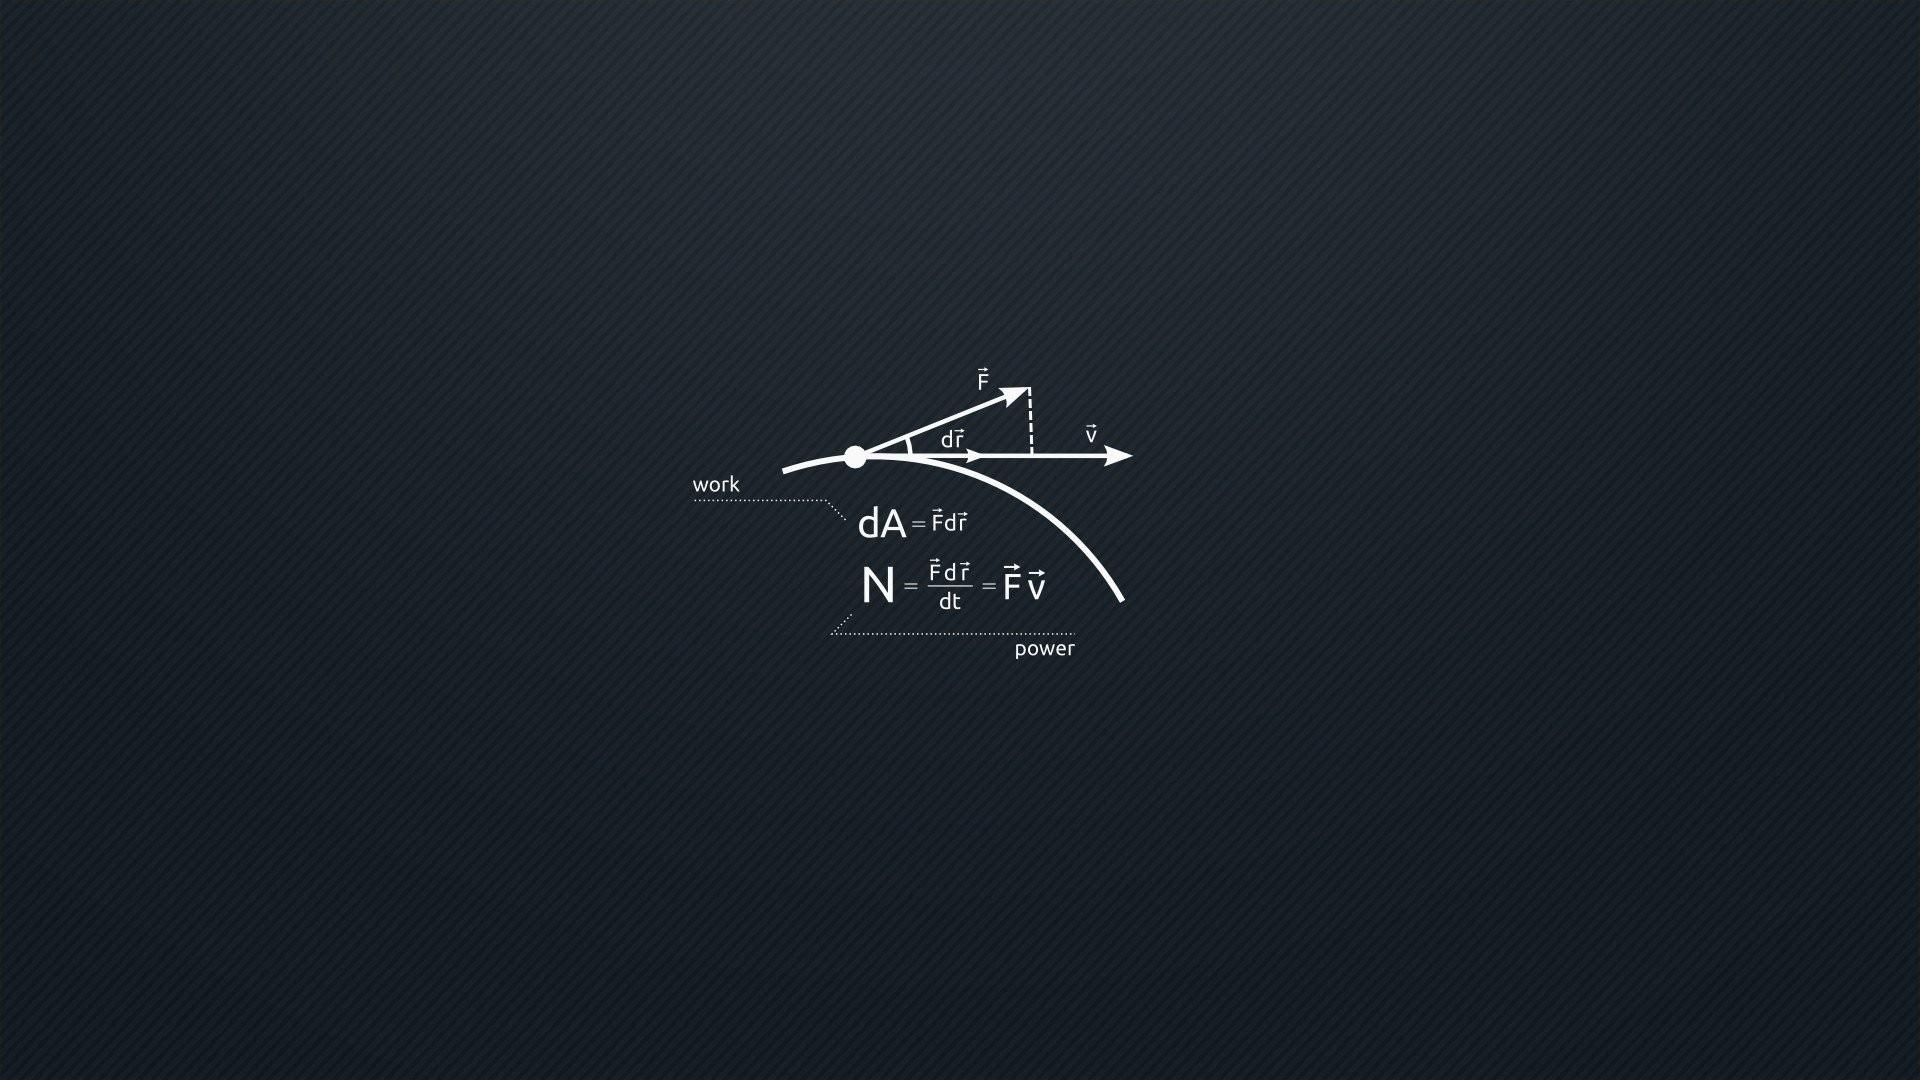 General 1920x1080 equation formula science minimalism simple background Flatdesign symbols